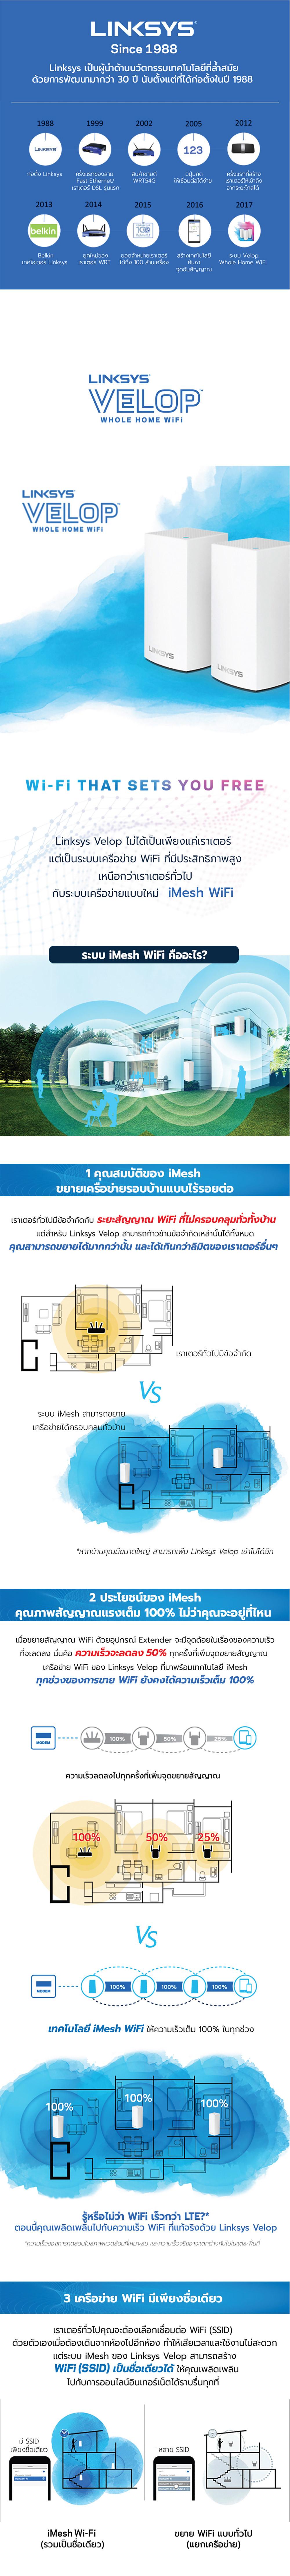 01-3000082011-linksys-velop-mesh-wifi-du